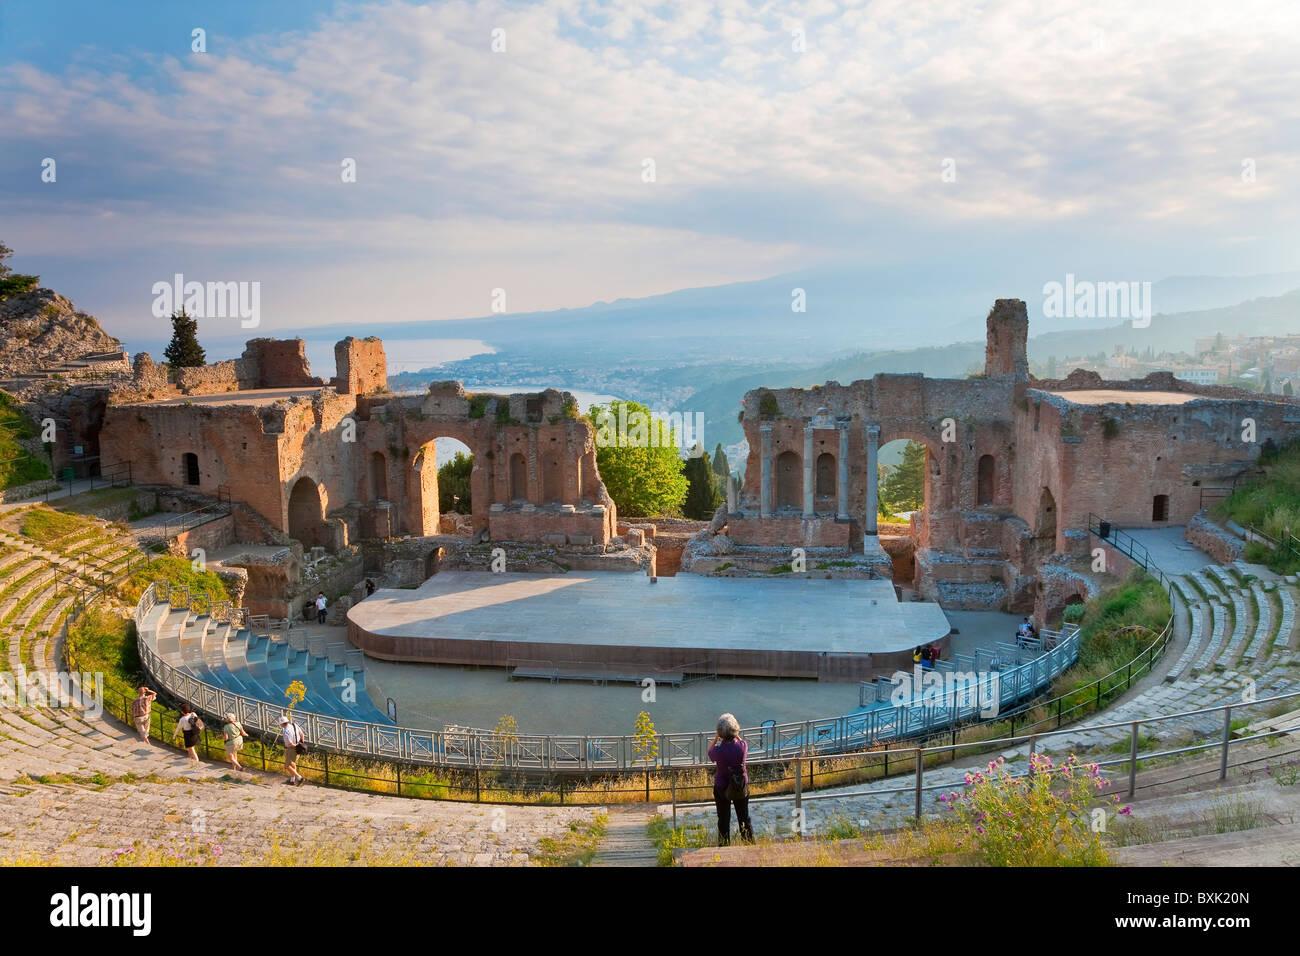 The Greek theatre, Taormina, Sicily, Italy - Stock Image